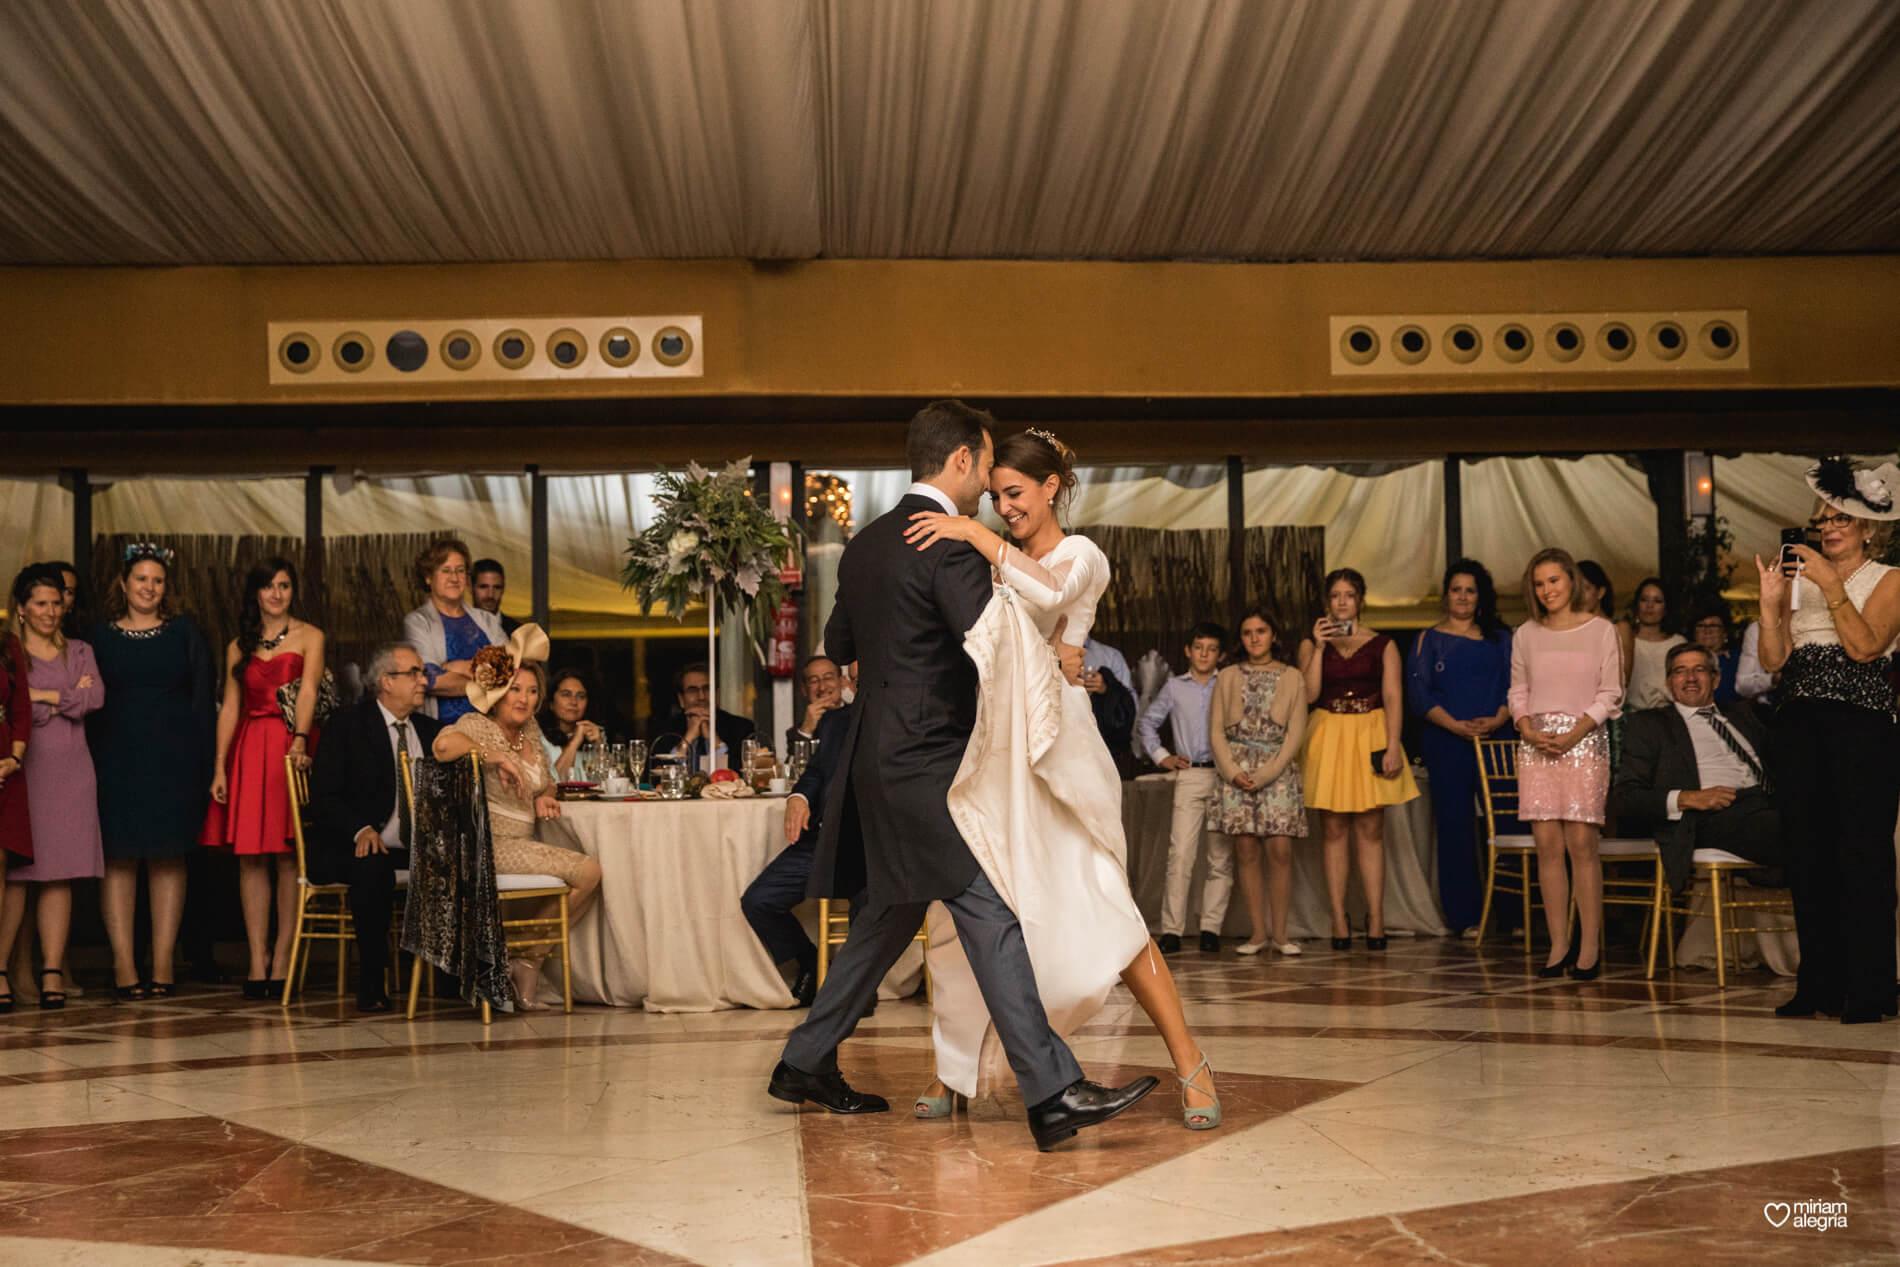 vestido-de-novia-paula-del-vas-miriam-alegria-fotografos-boda-murcia-150